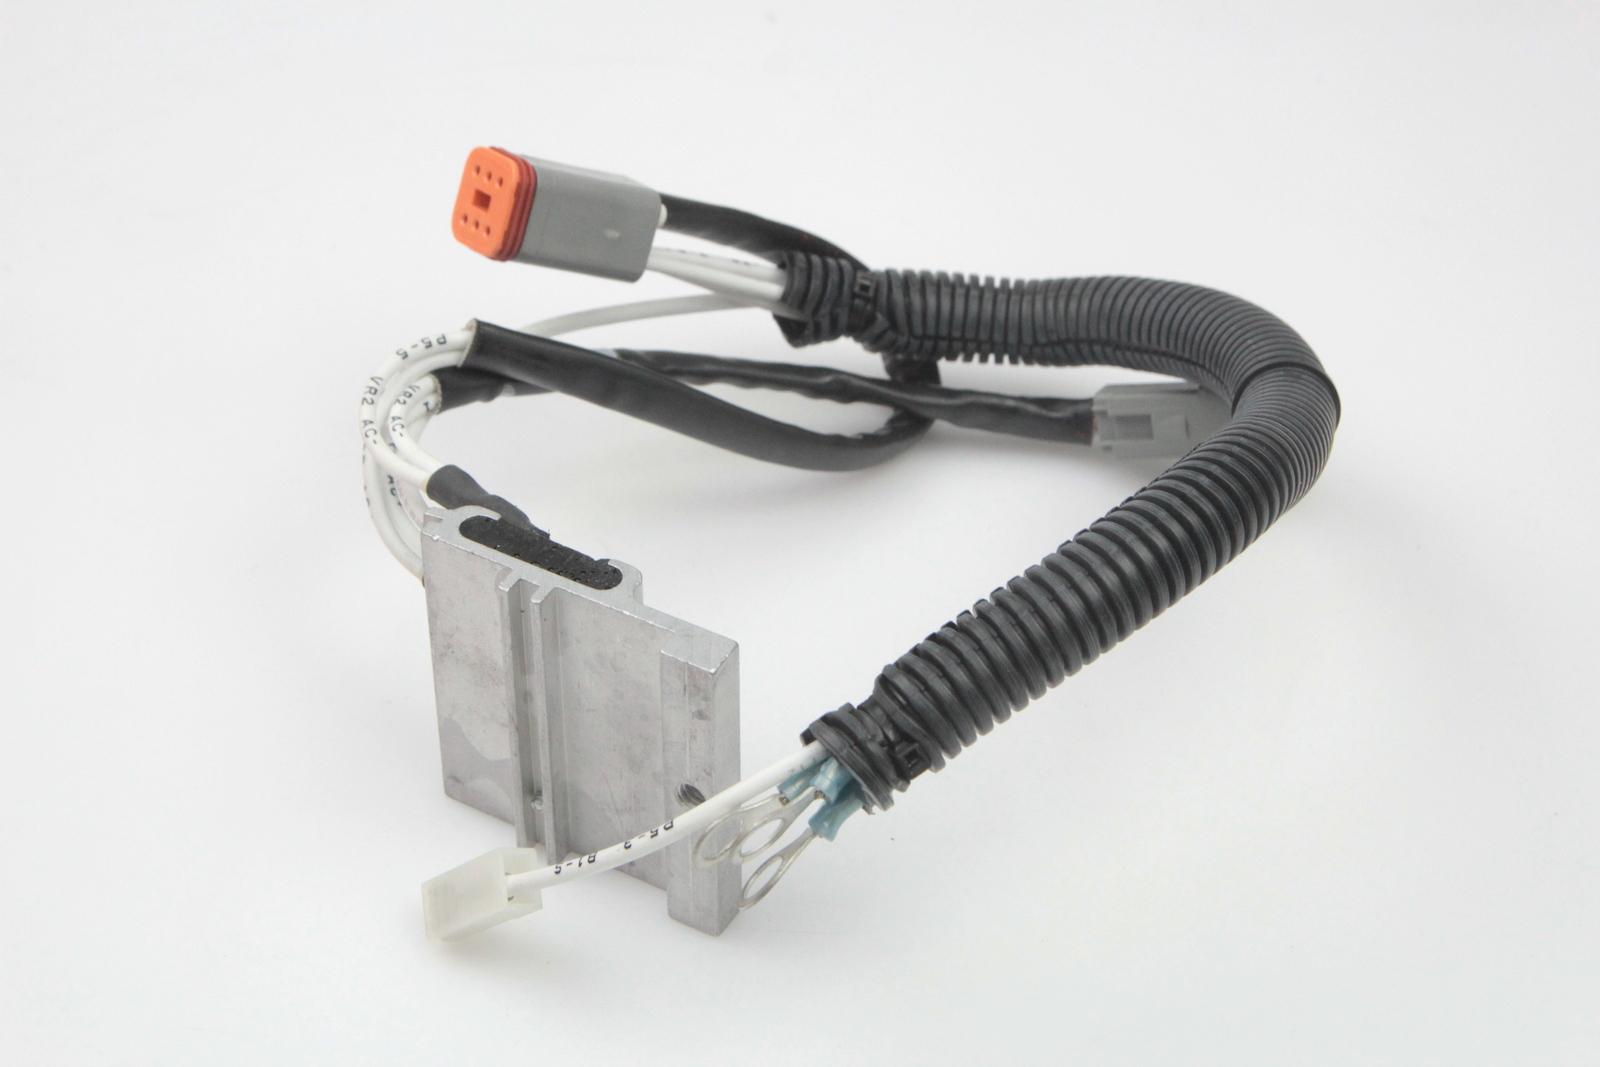 Automotive Voltage Regulators External Voltage Regulator For 1989 1993 1st Gen Dodge Ram Cummins 150 250 350